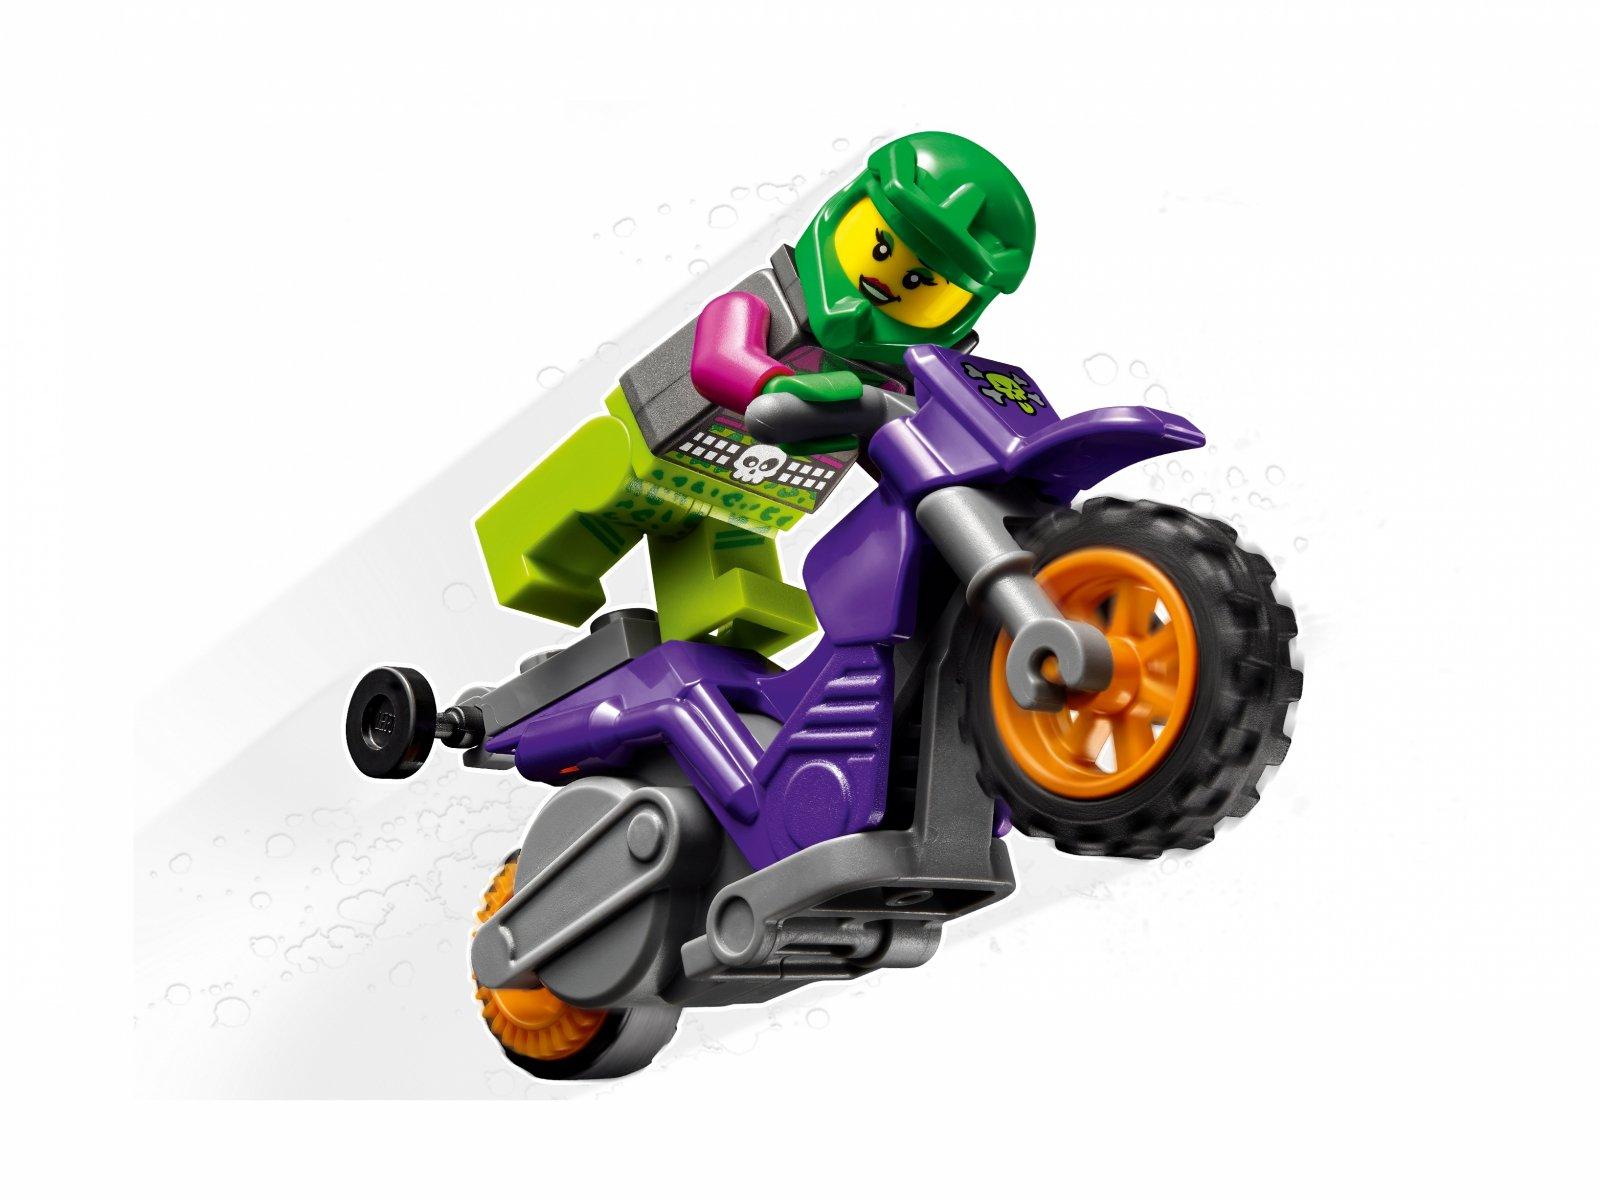 LEGO City 60296 Wheelie na motocyklu kaskaderskim